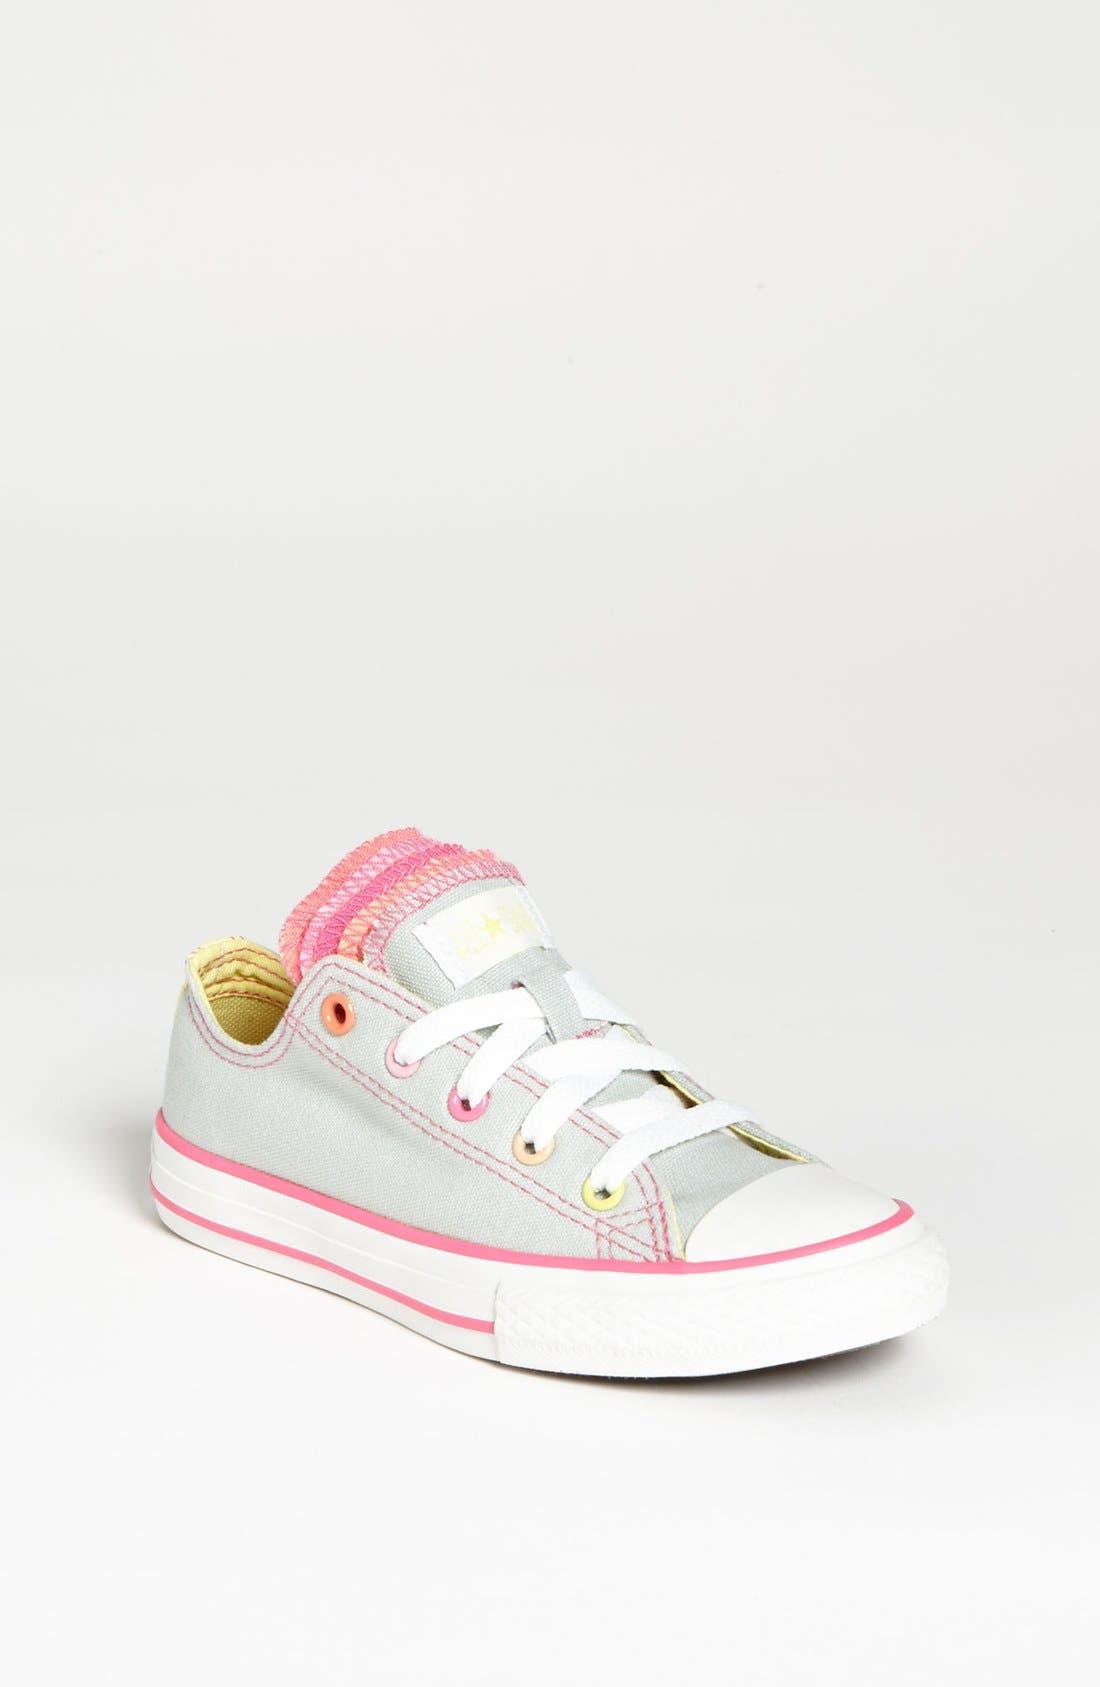 Main Image - Converse All Star® Multi-Tongue Sneaker (Toddler, Little Kid & Big Kid)